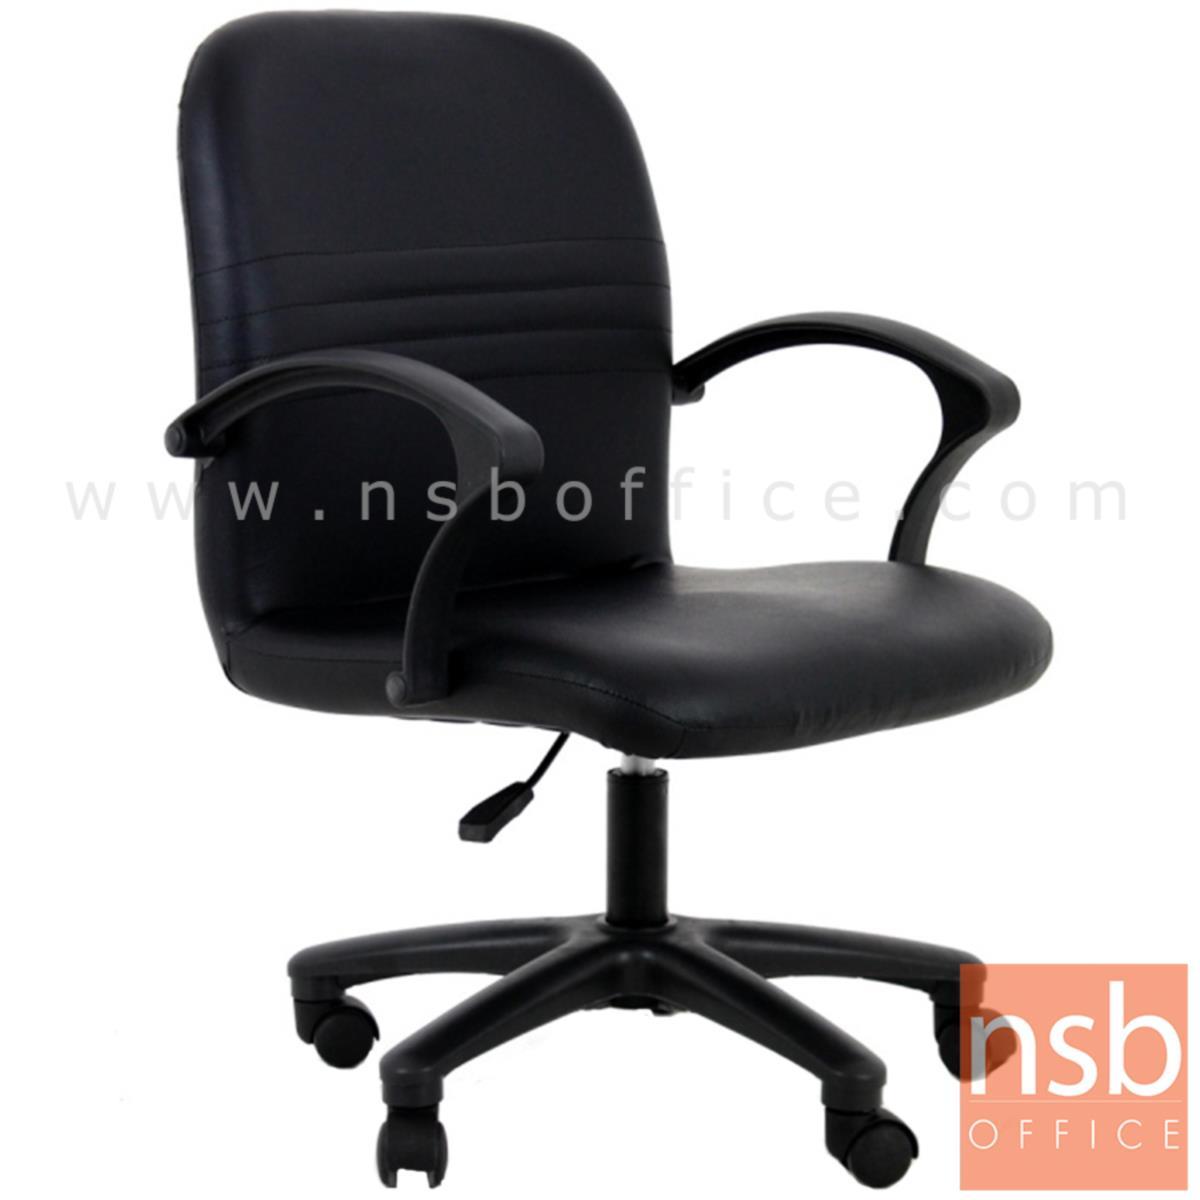 B03A464:เก้าอี้สำนักงาน  รุ่น Wallest (วอลเลซ) โช๊คแก๊ส ขาเหล็กชุบโครมเมี่ยม, ขาพลาสติก